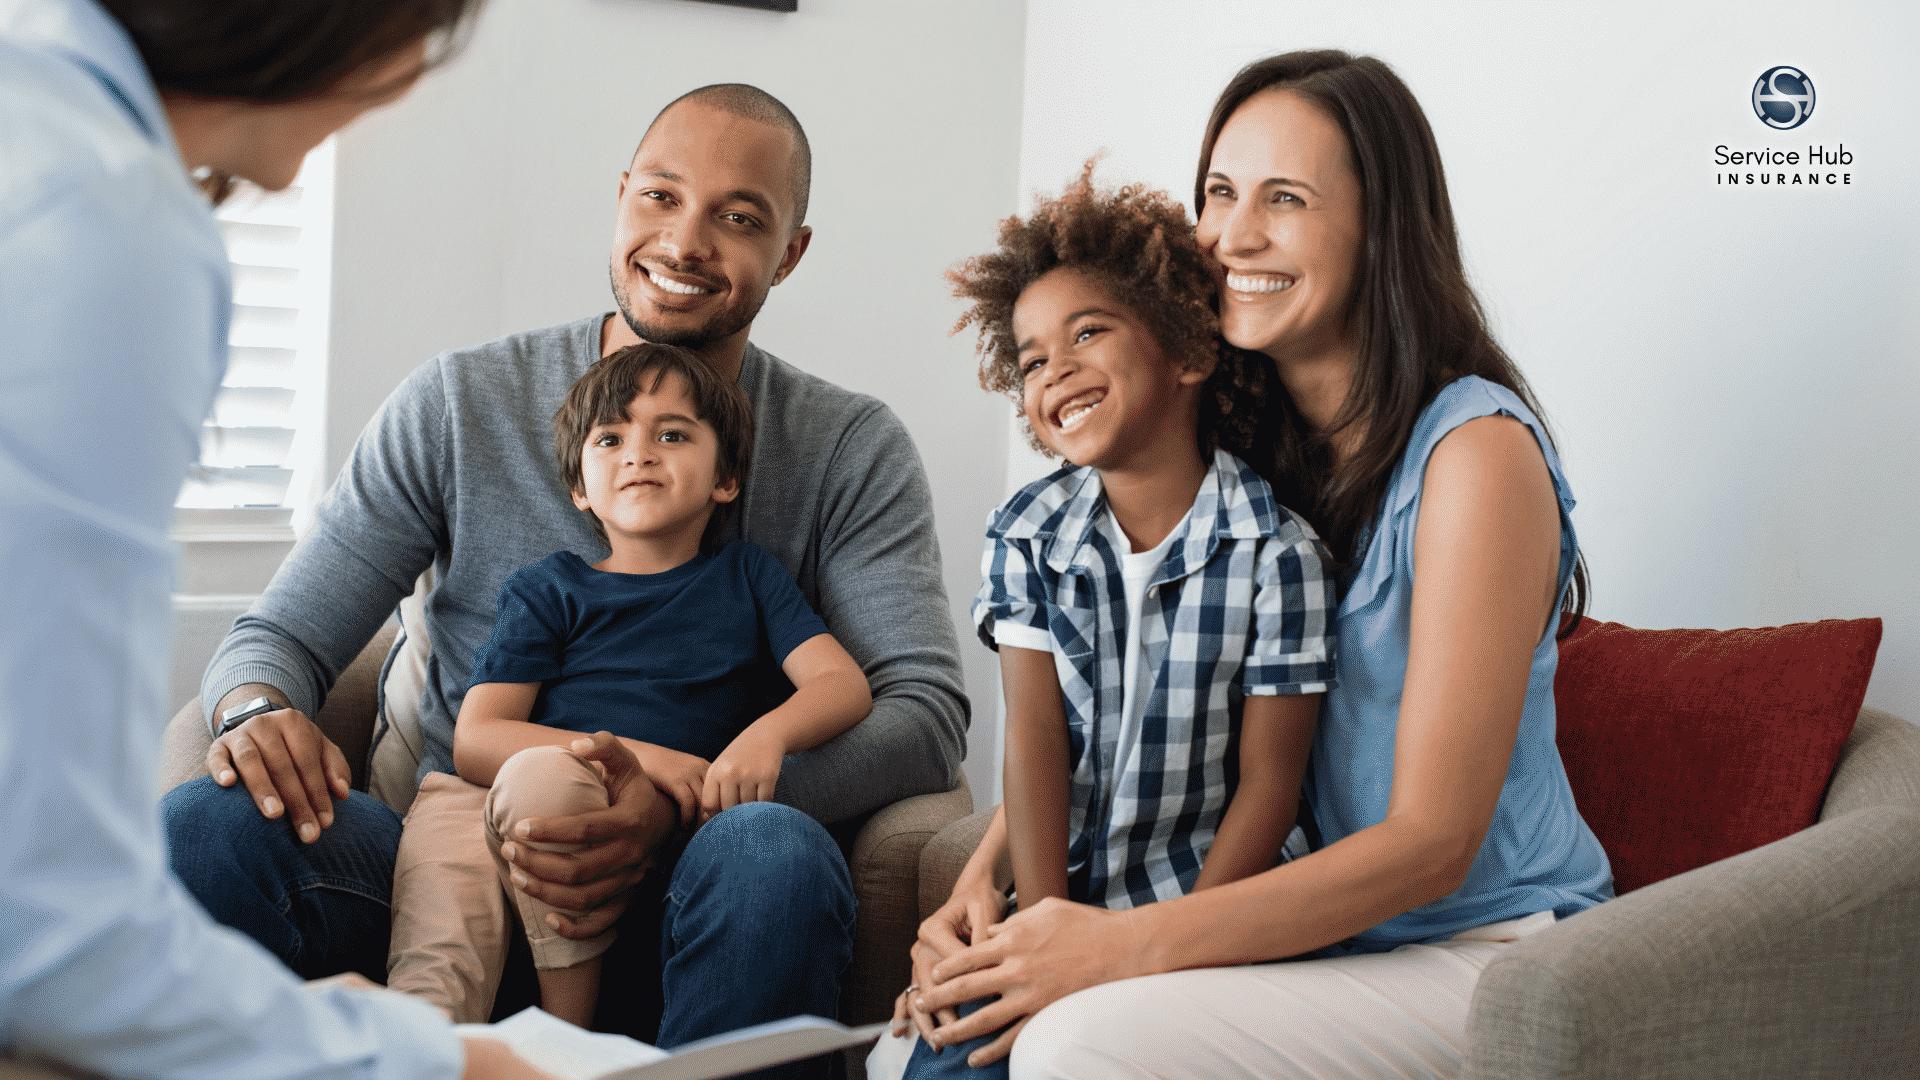 Supplemental Insurance - Service Hub Insurance